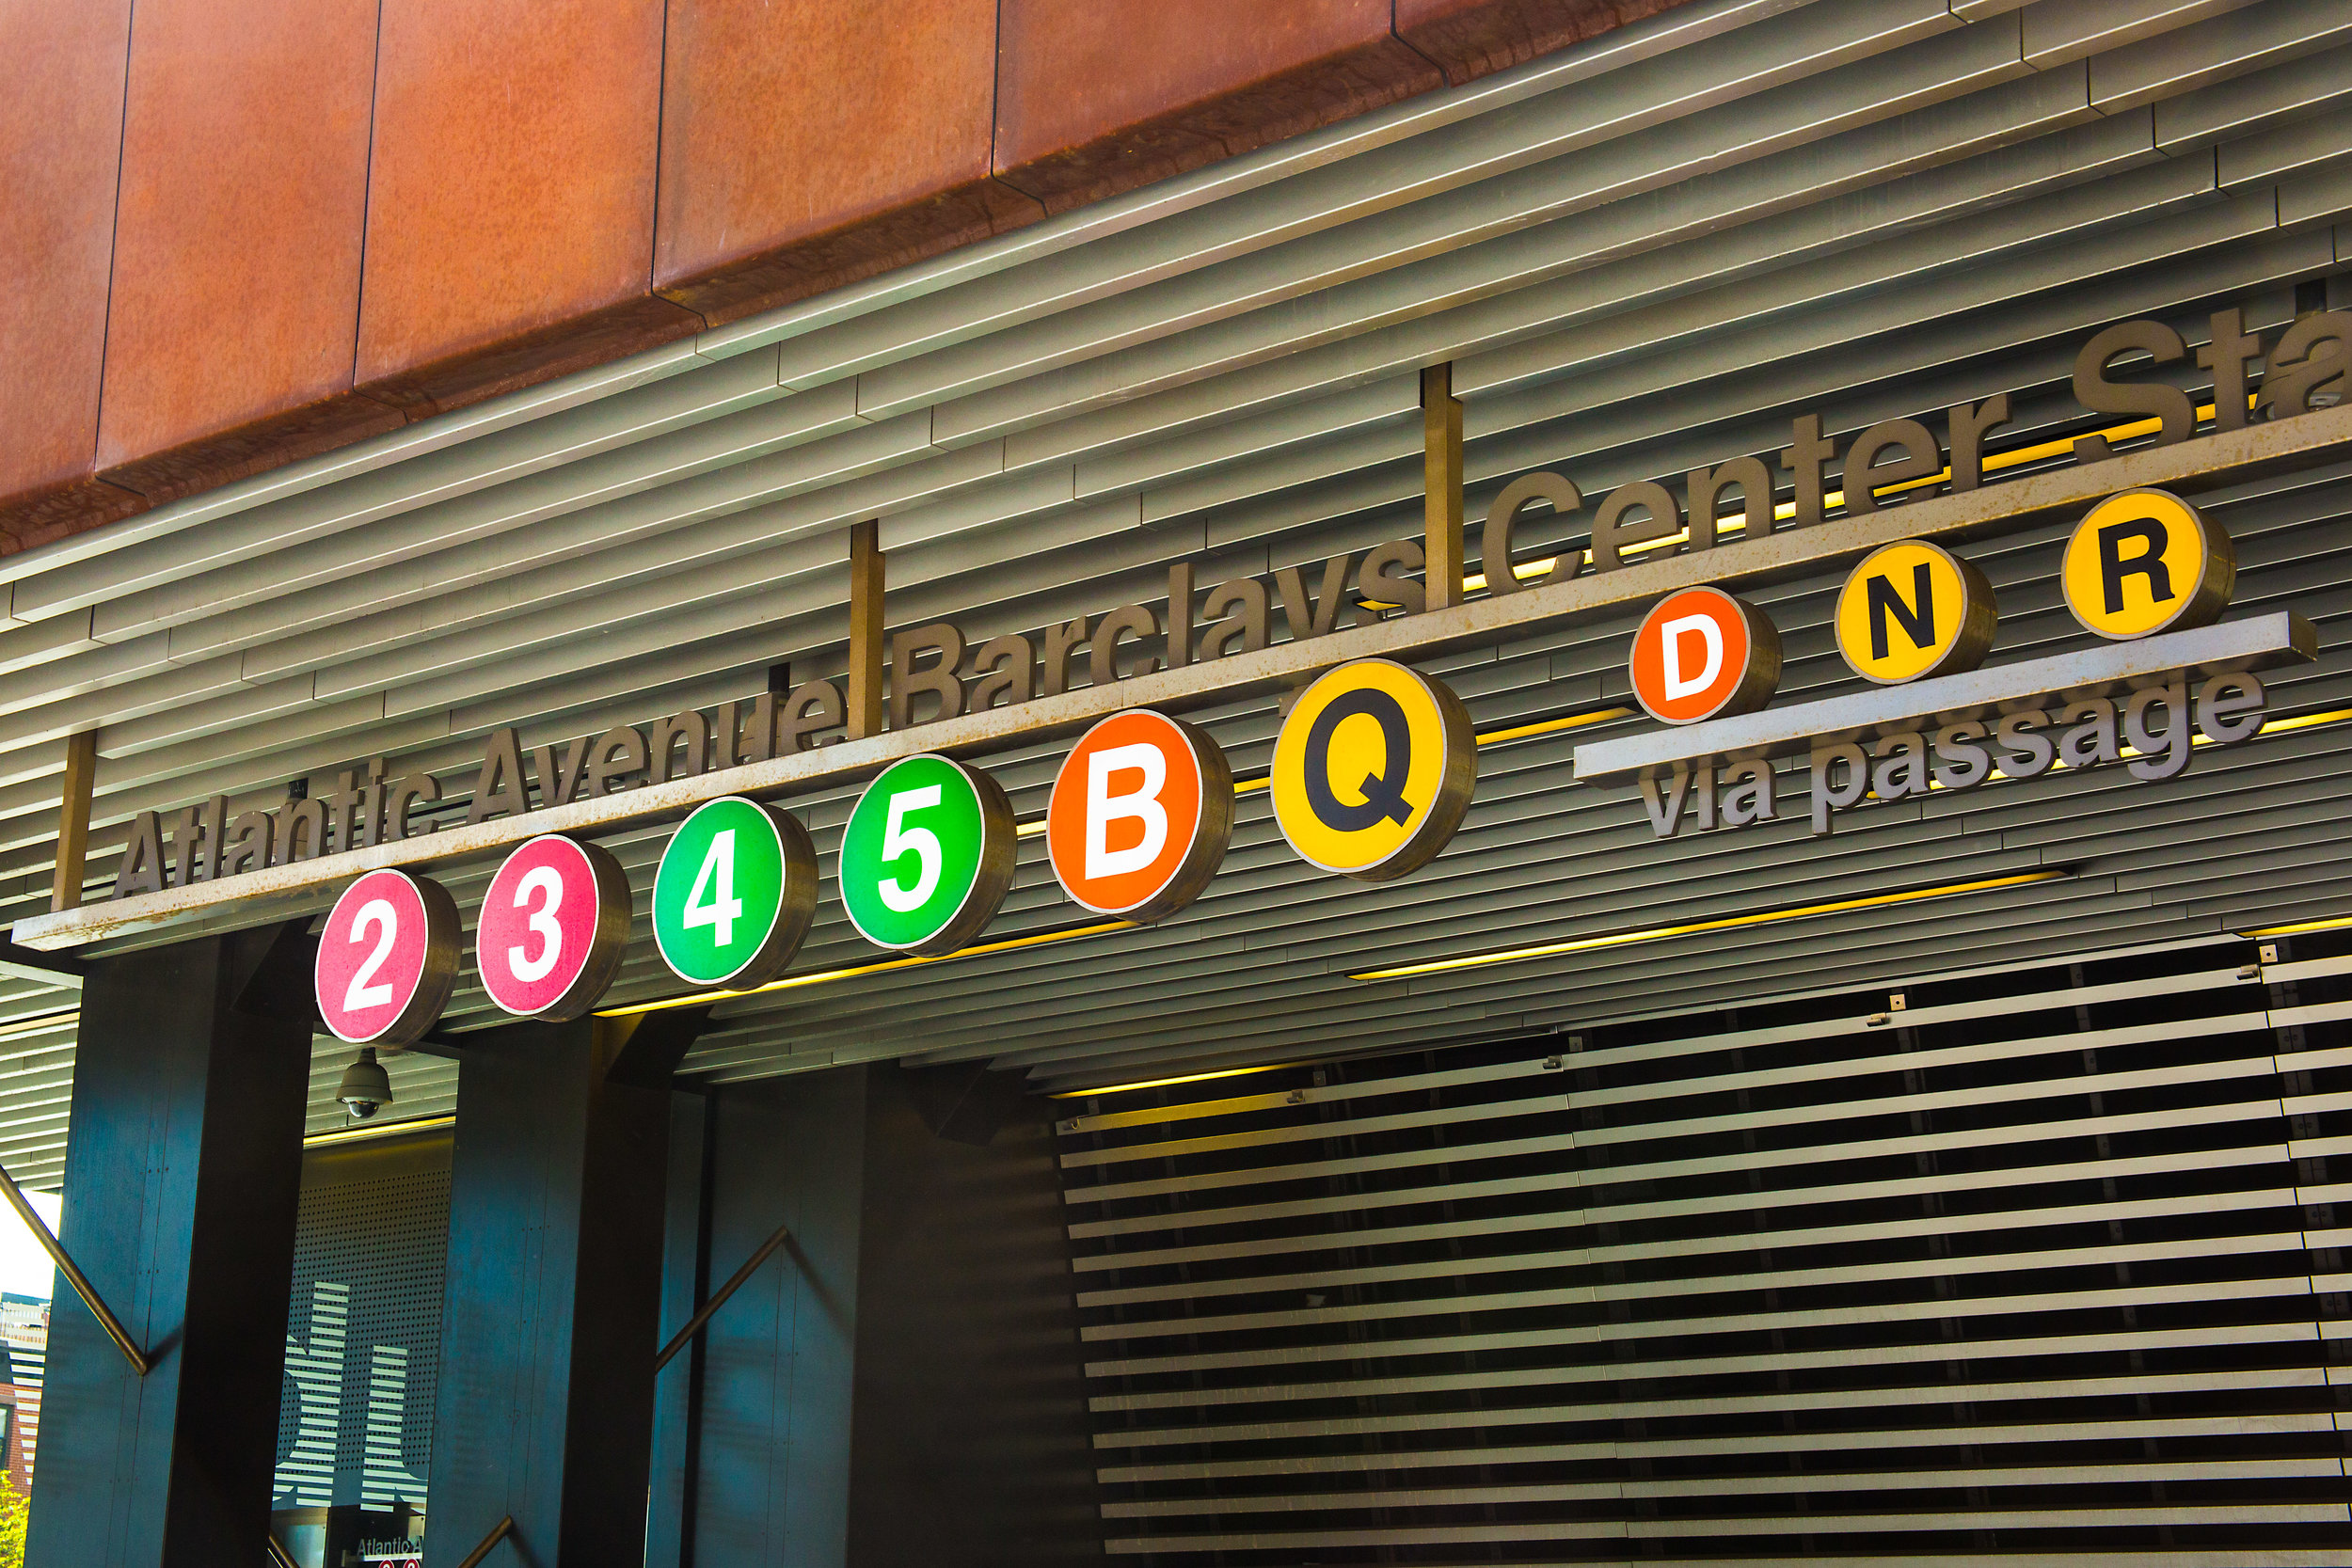 LSNY_Barclays-Center-Area-2.jpg